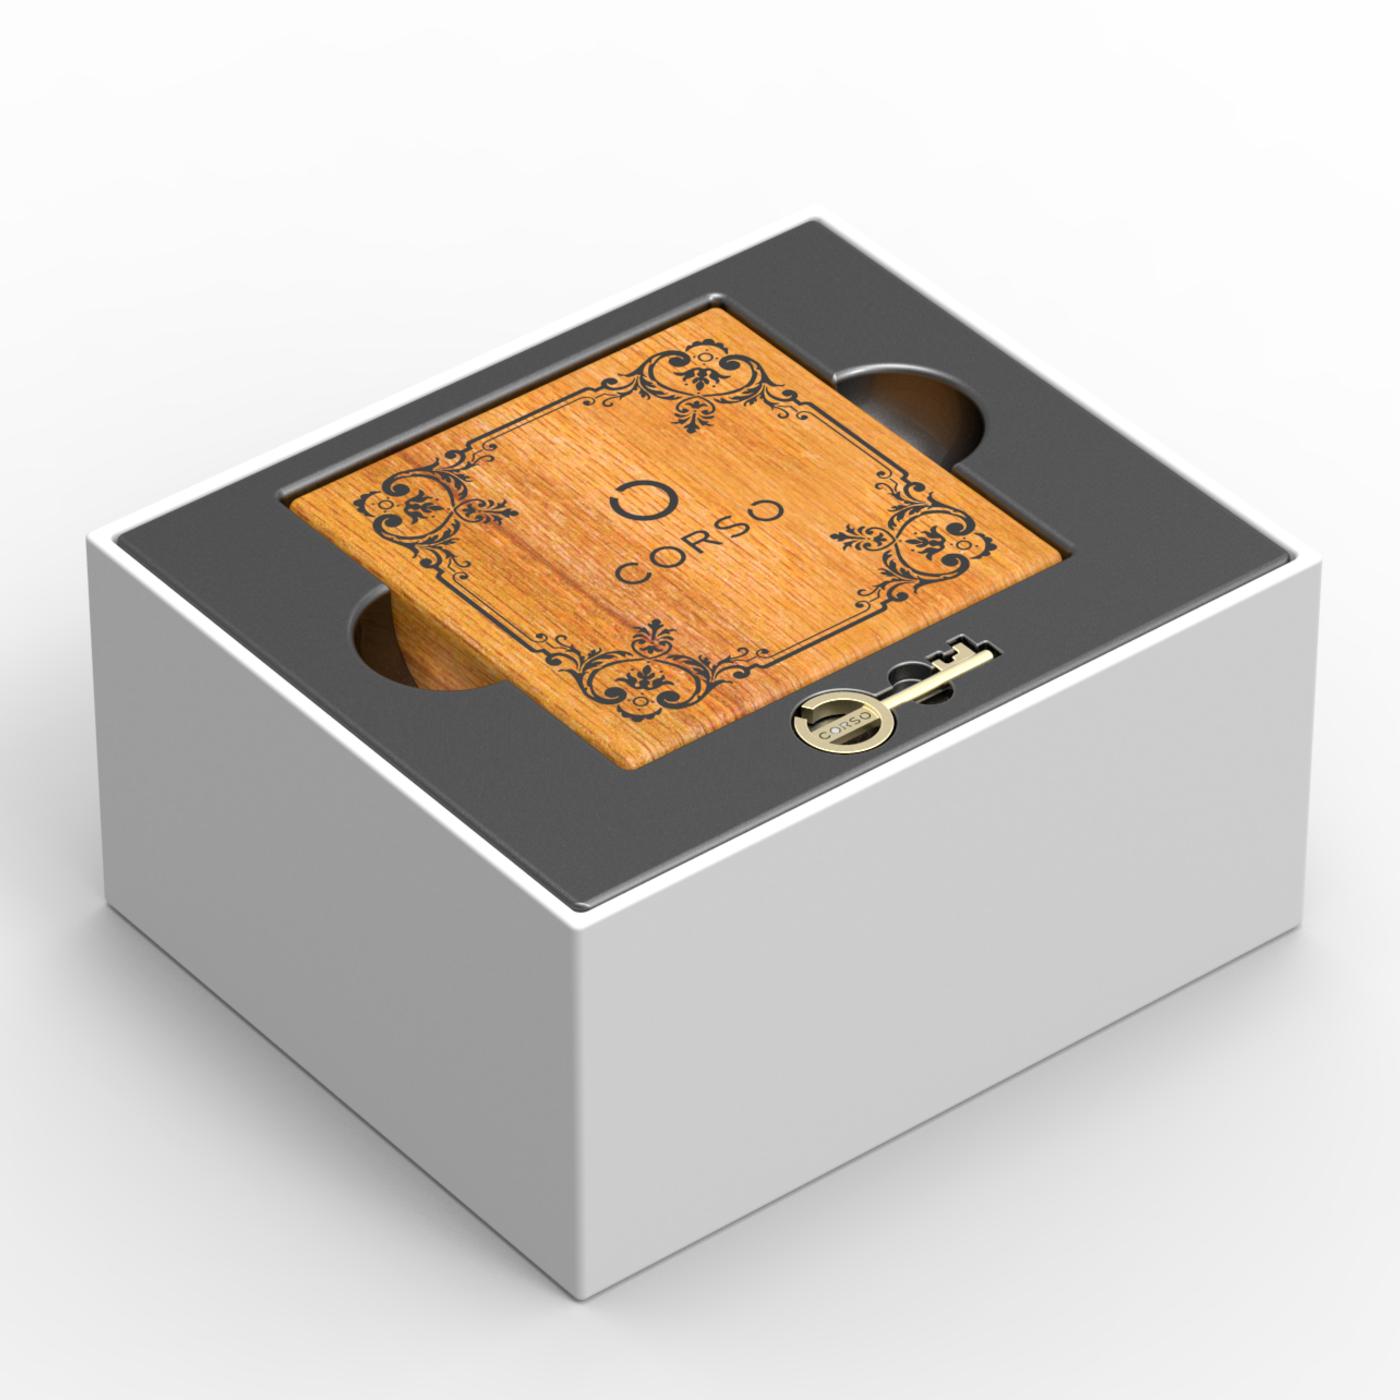 Luxurious Wrist Watch Box